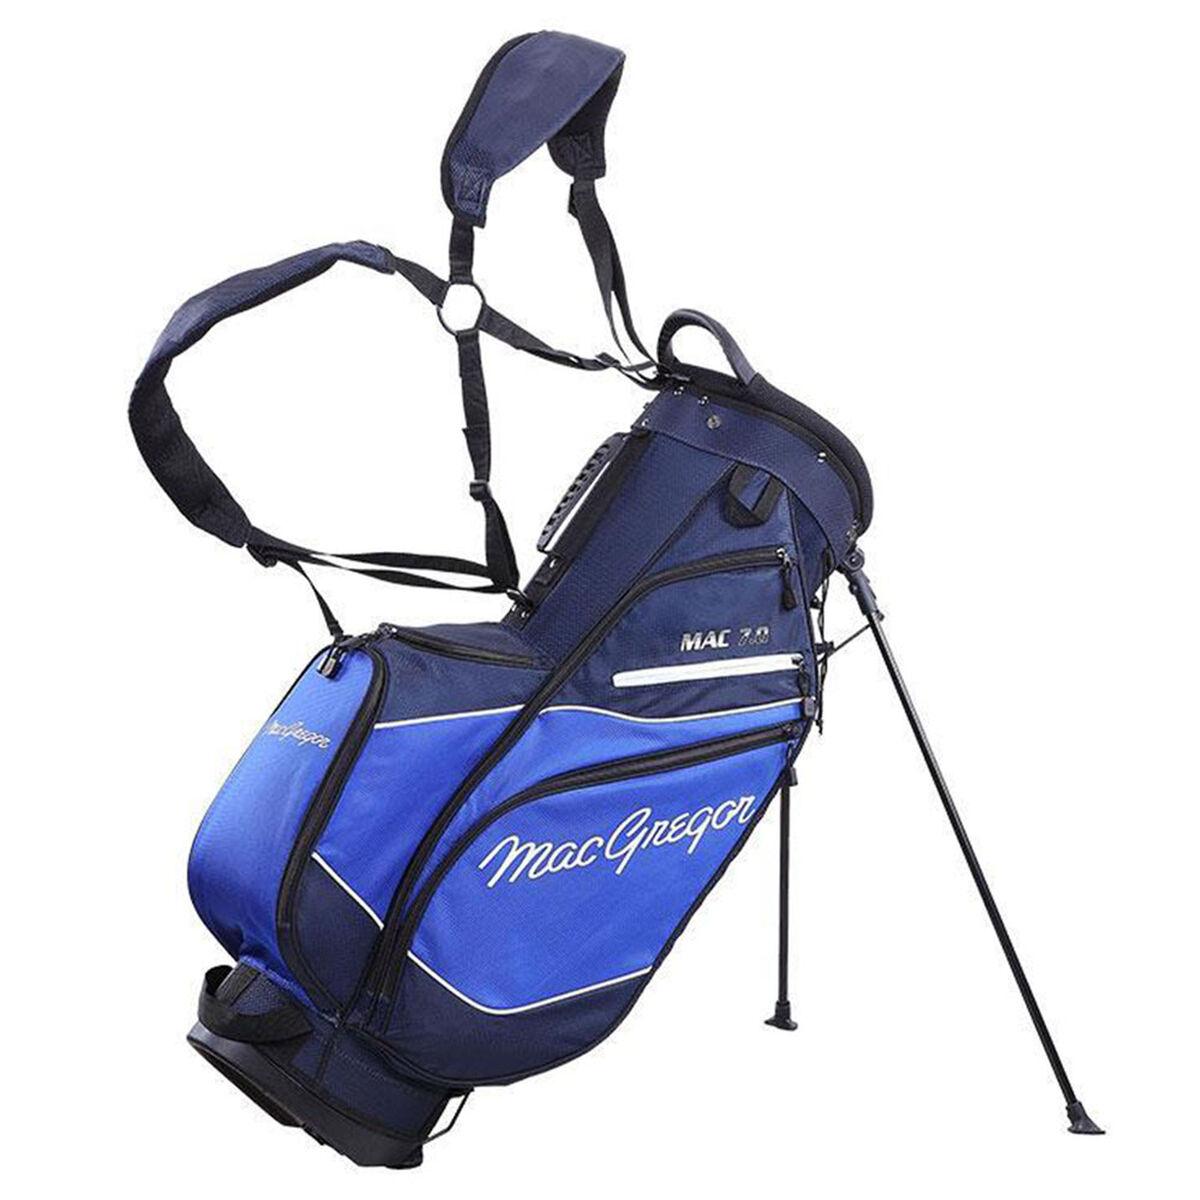 MacGregor MAC 7.0 Golf Stand Bag, Navy/royal   American Golf